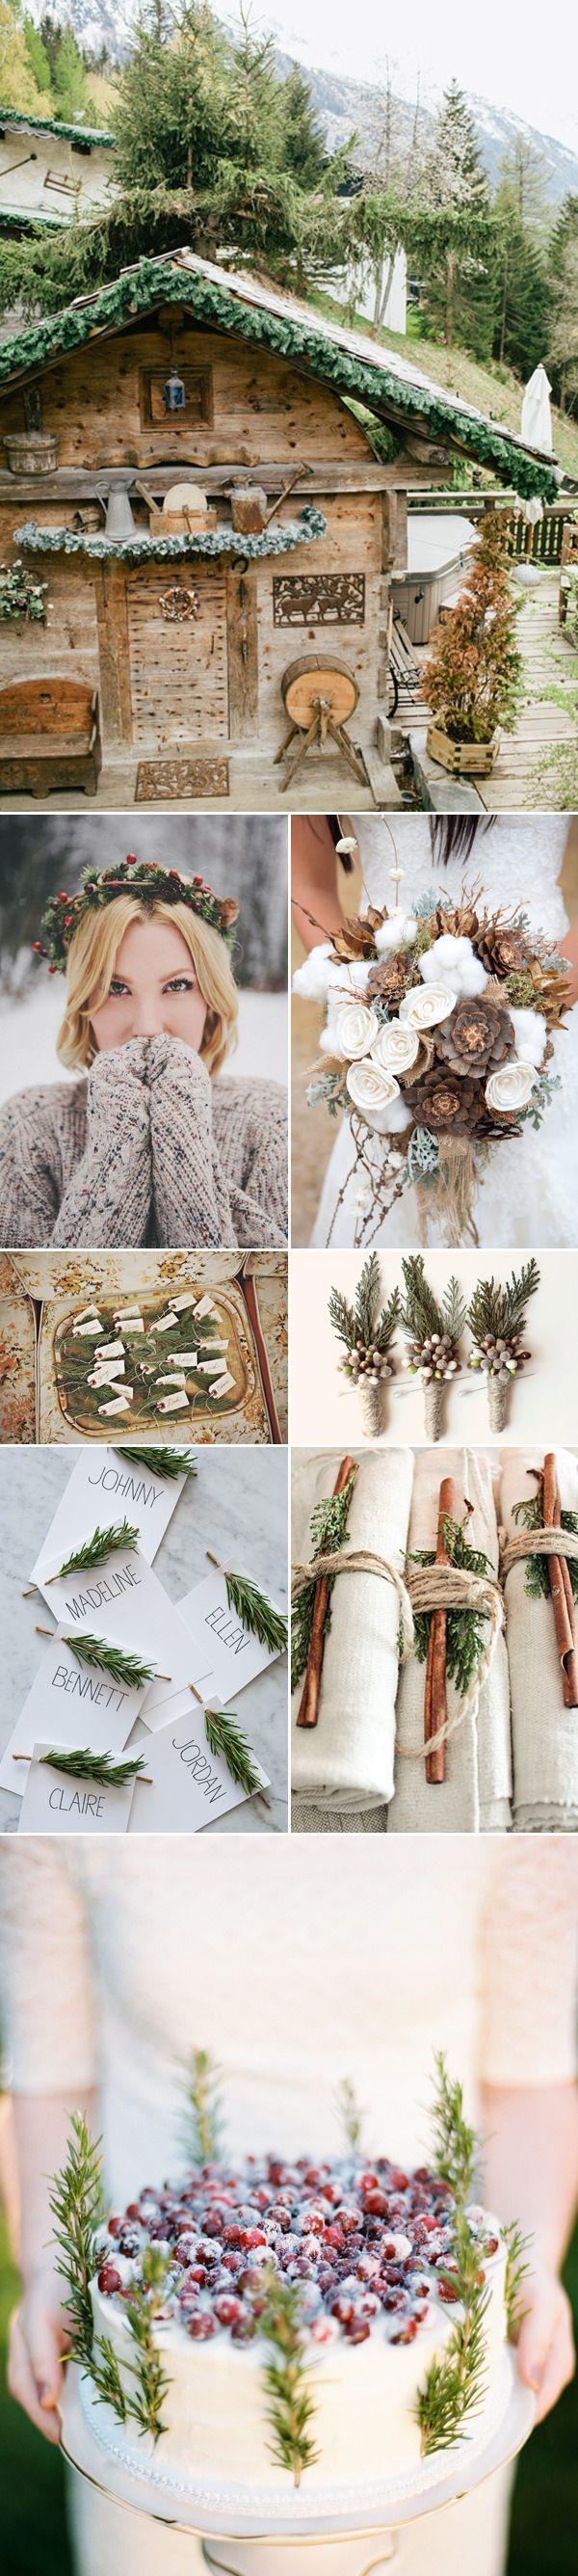 winter-wedding-ideas-vintage-winter-wedding-7